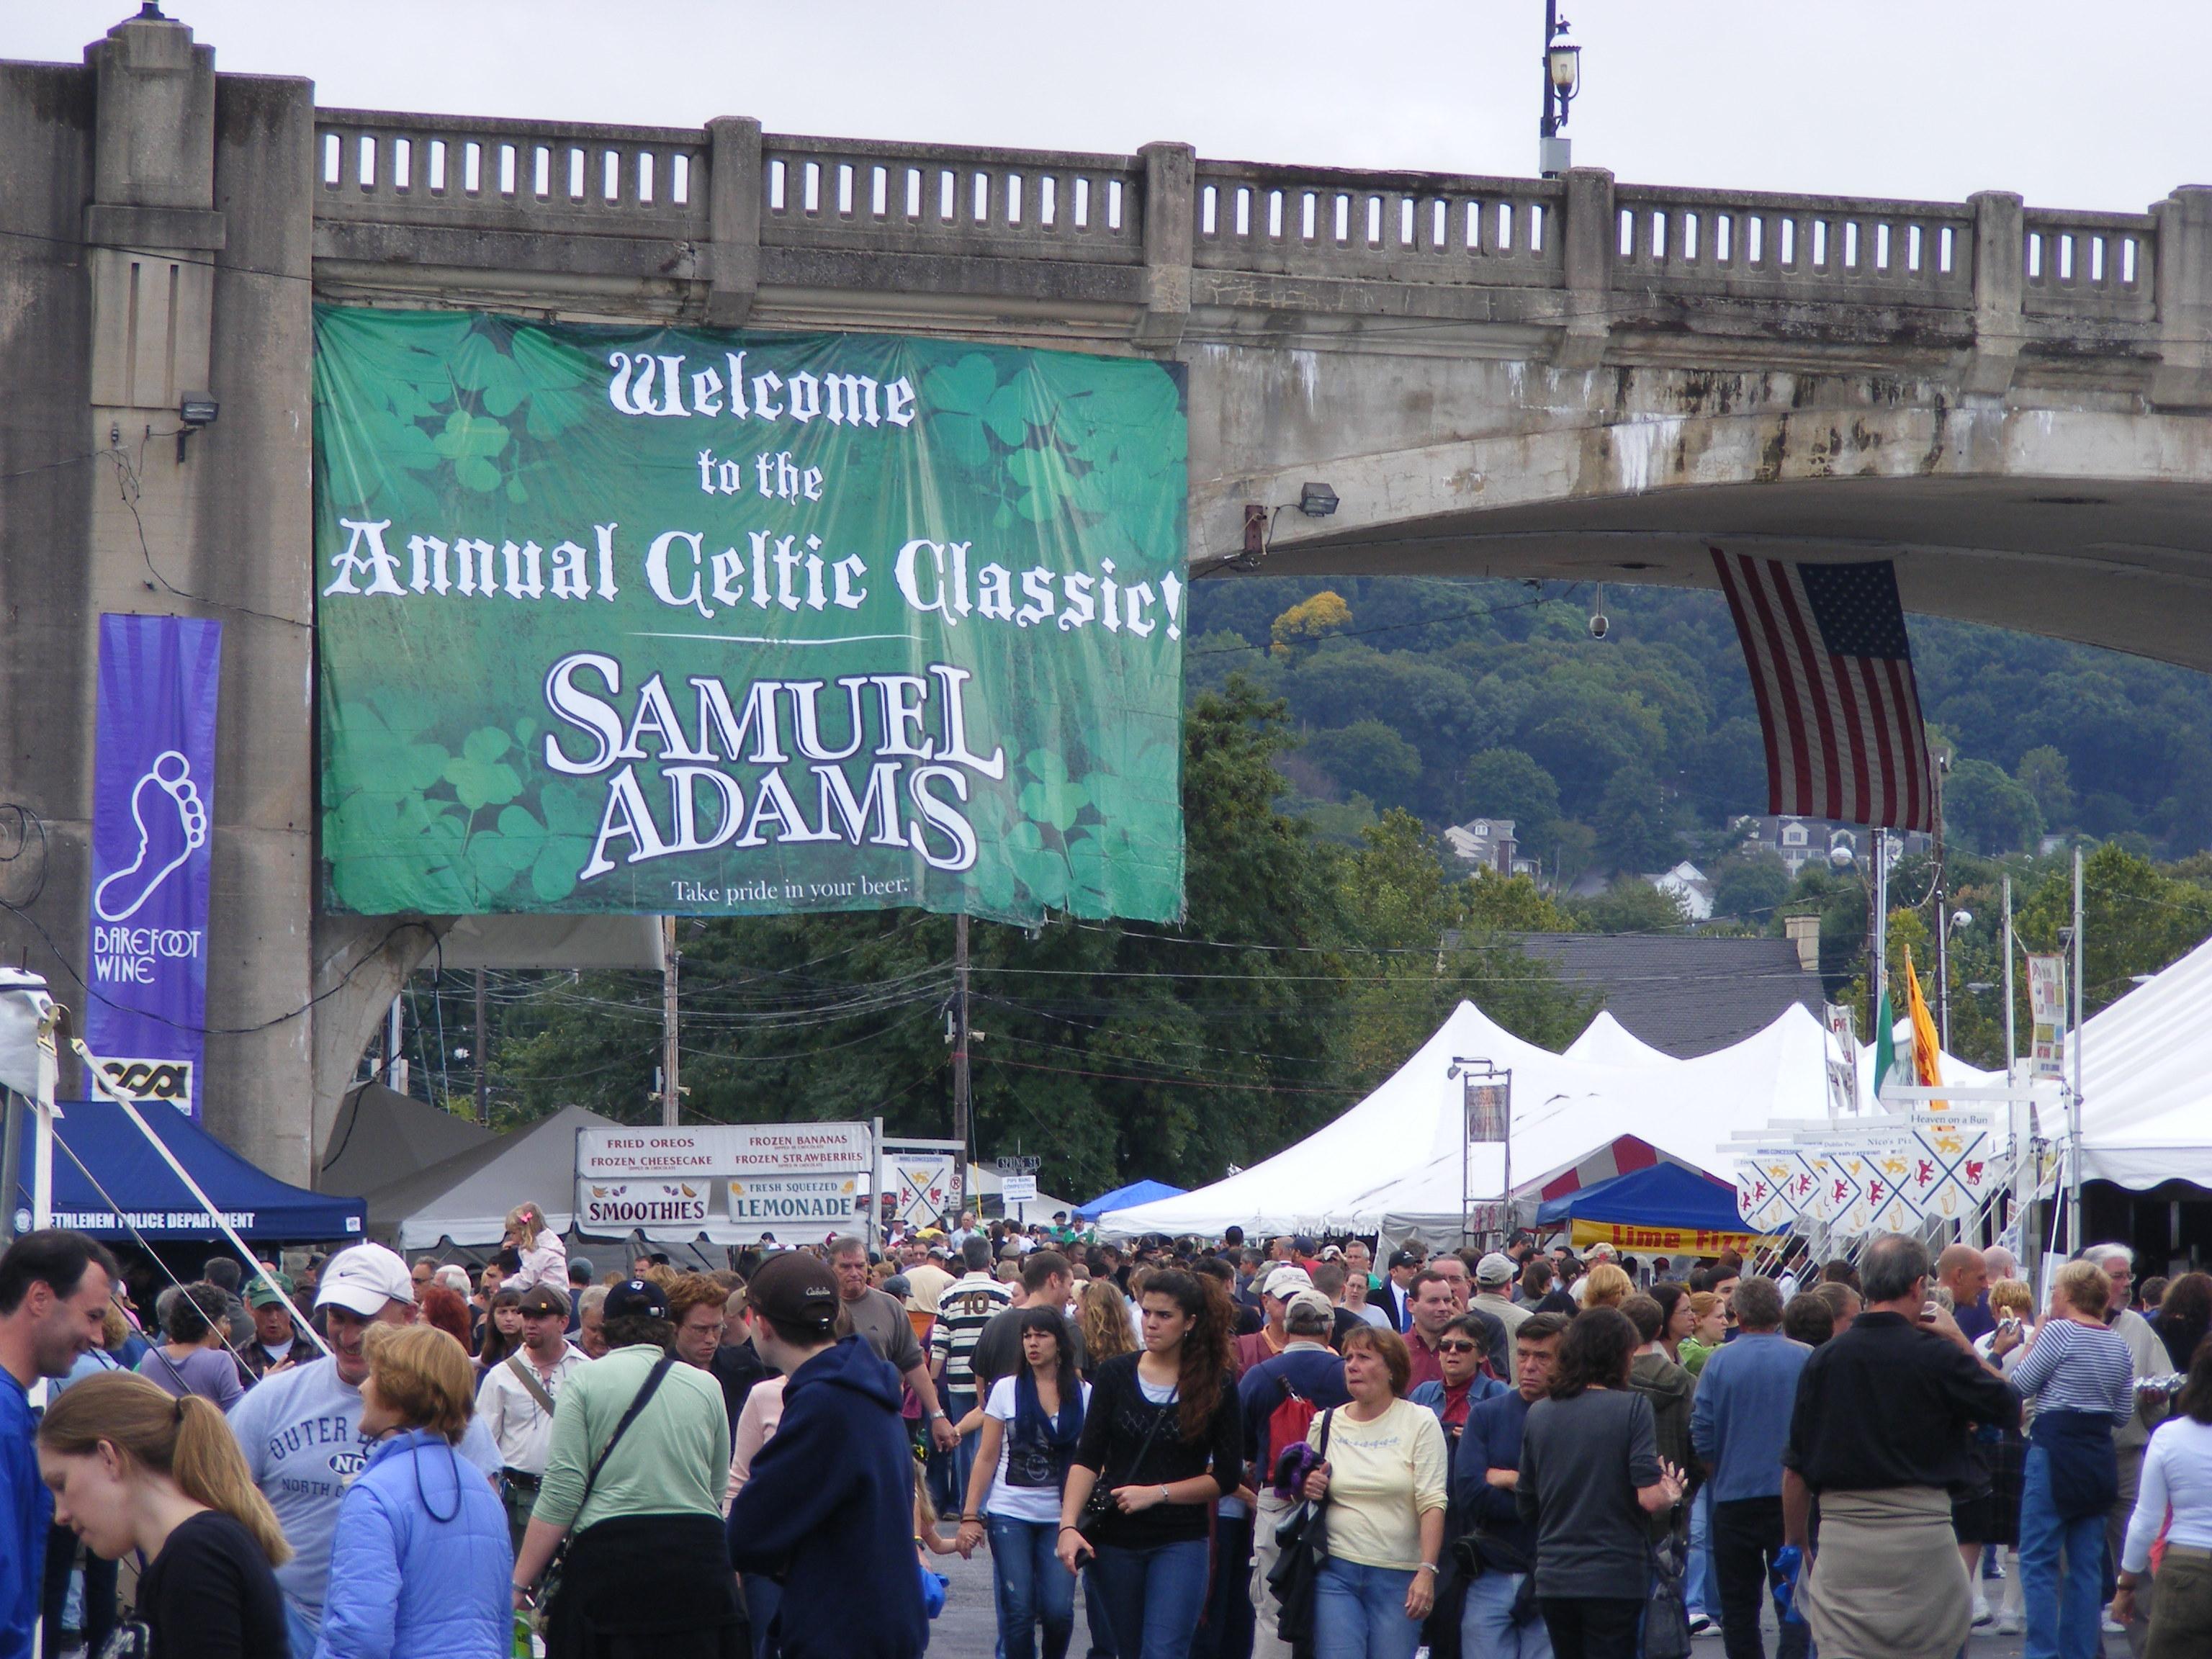 Bethlehem's Celtic Classic